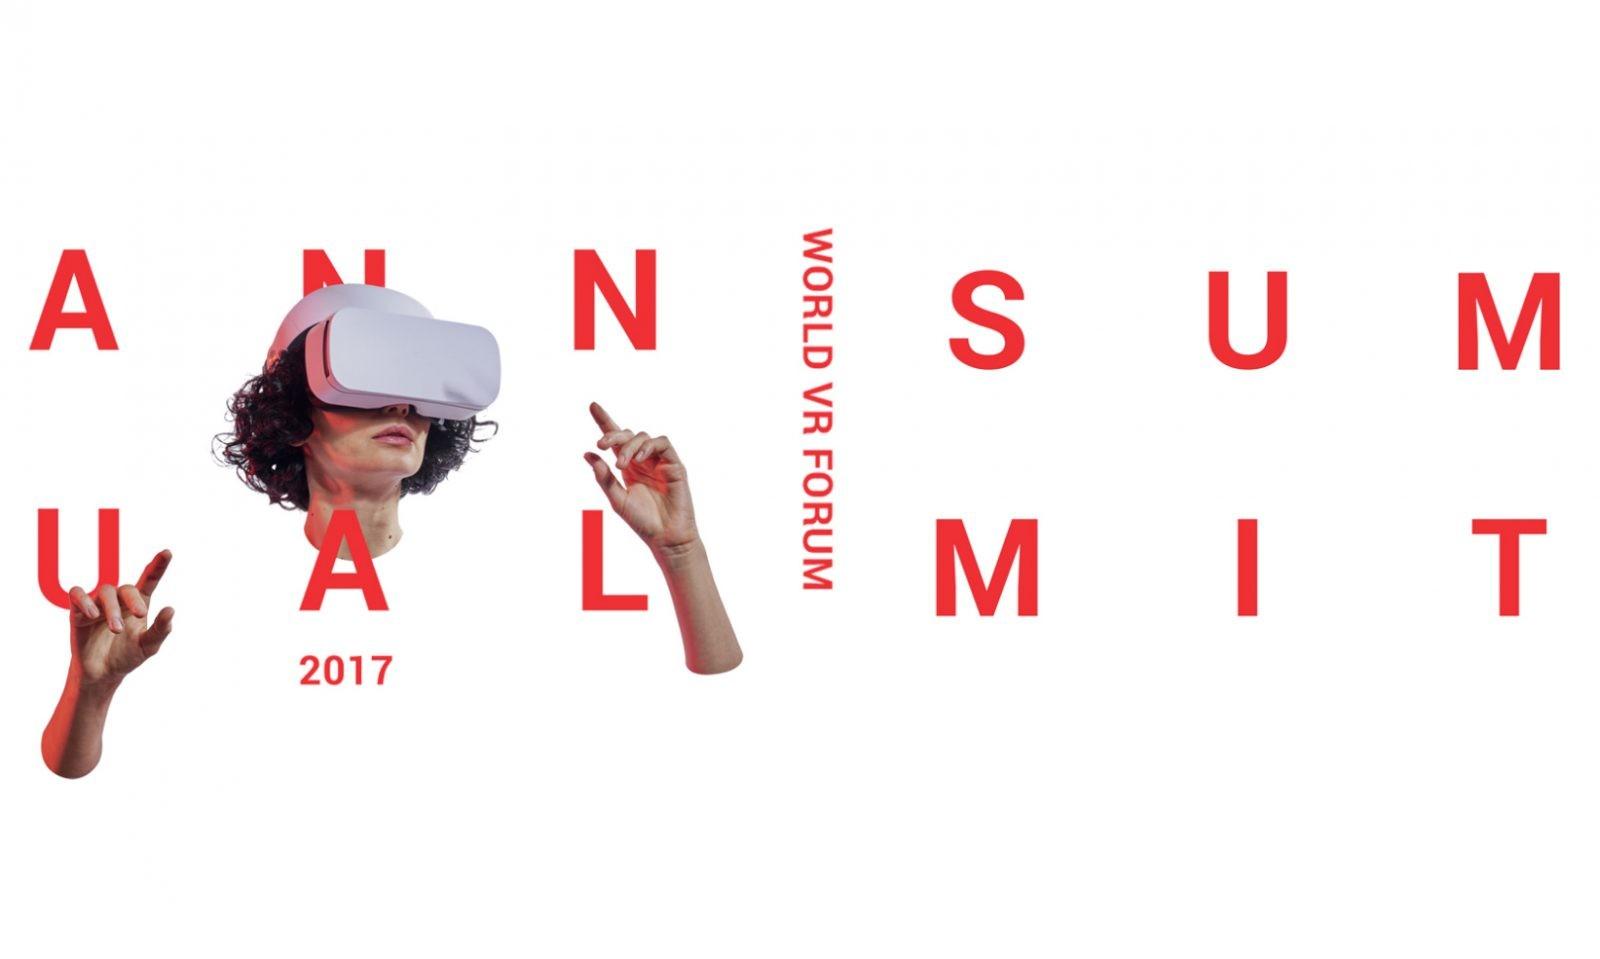 VR forum - הפורום העולמי השני בשוויץ